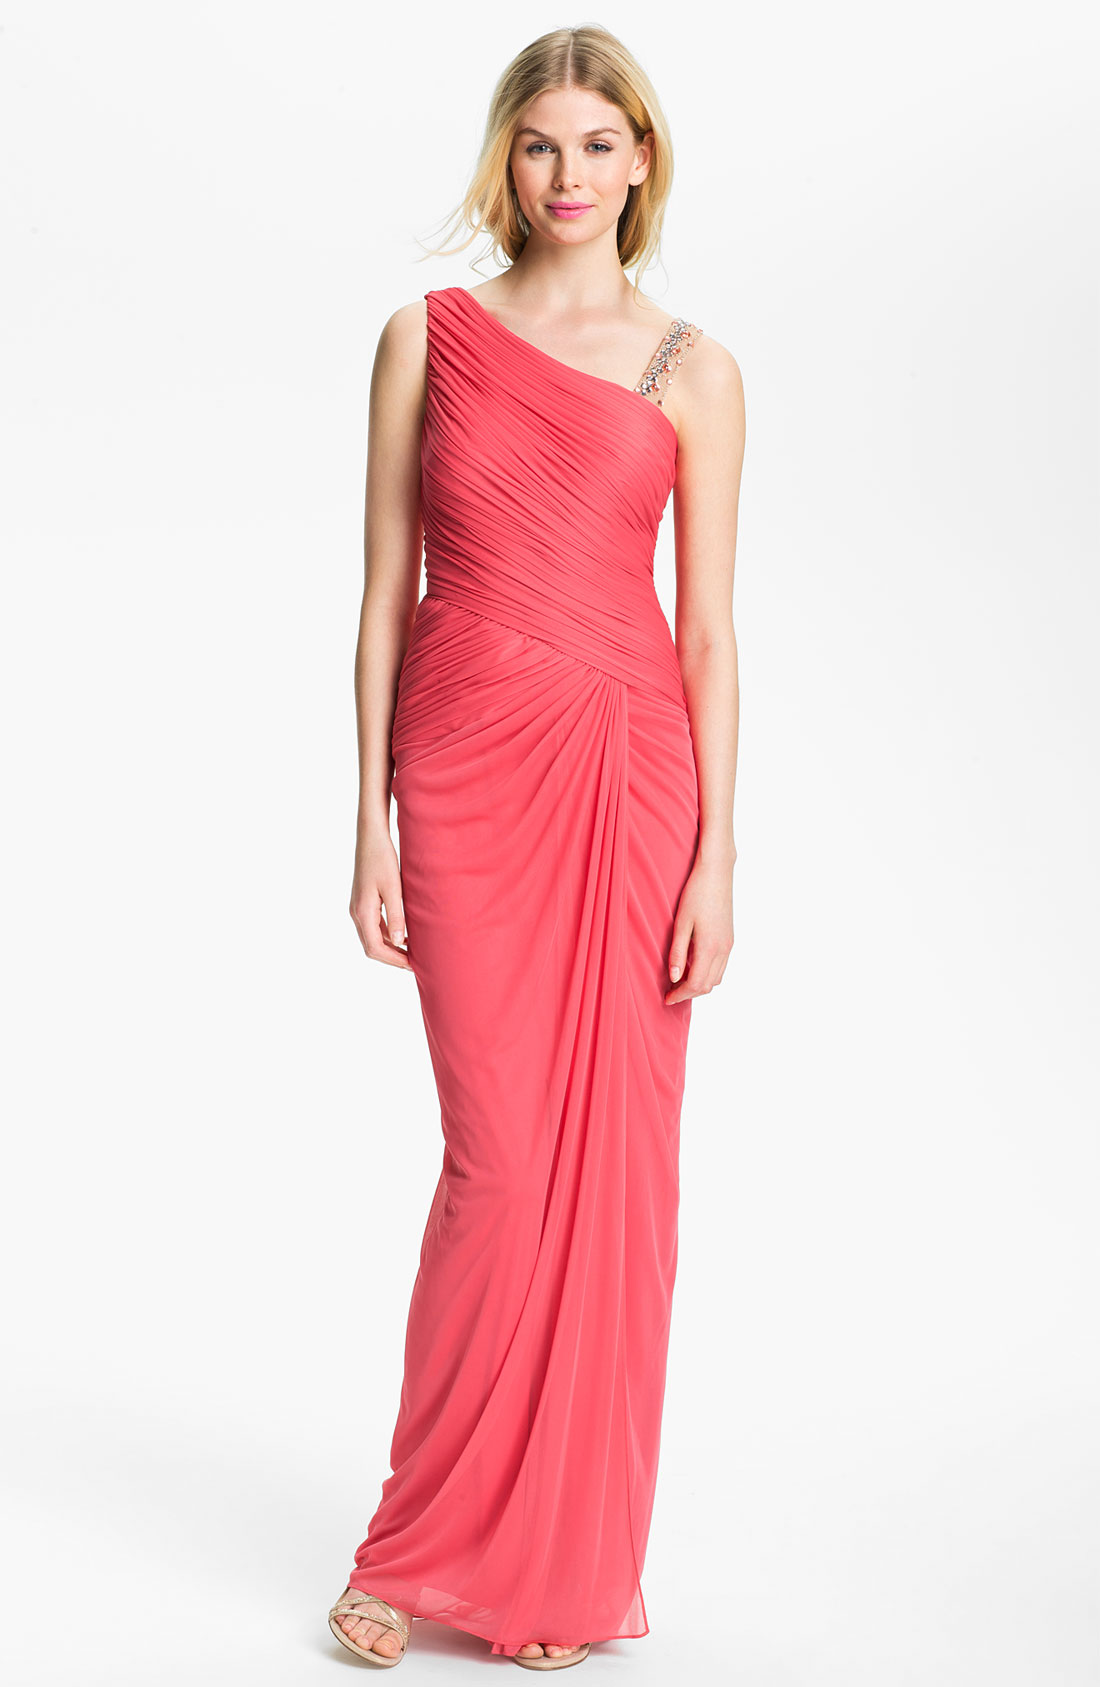 ADRIANNA PAPELL Embellished Mesh Gown SHRIMP Size 10 #412 | eBay